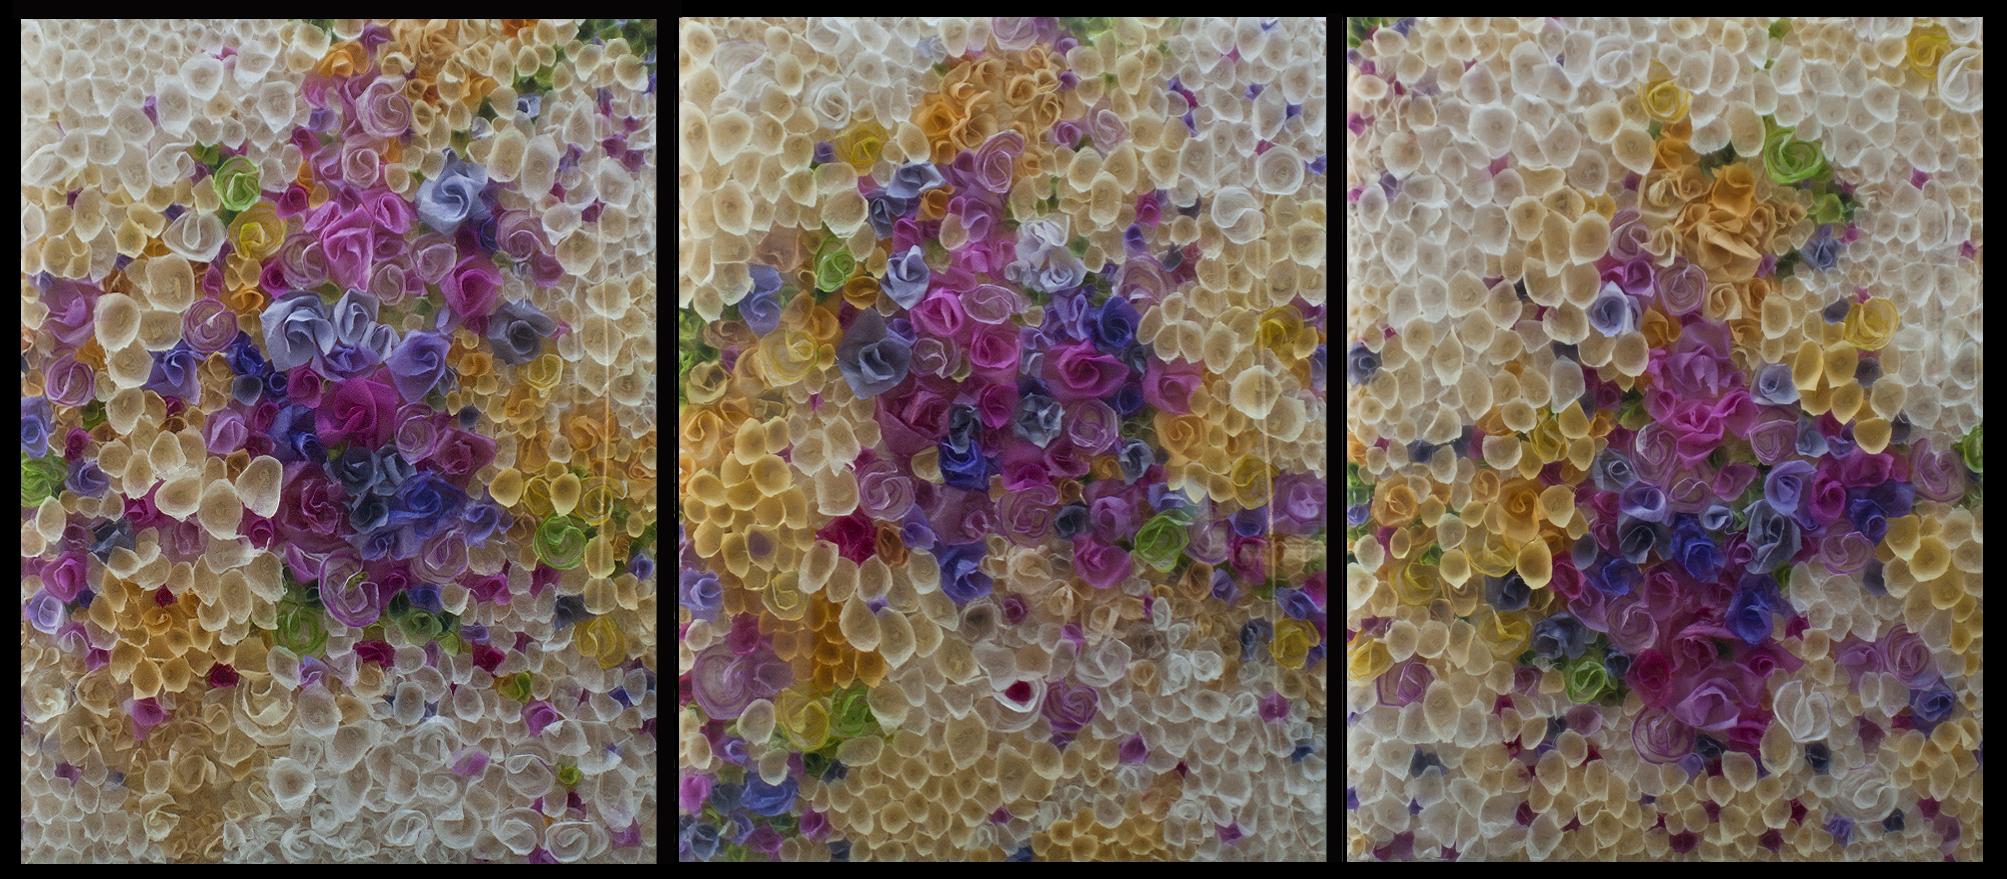 Sunburst 1, 2 & 3 triptych